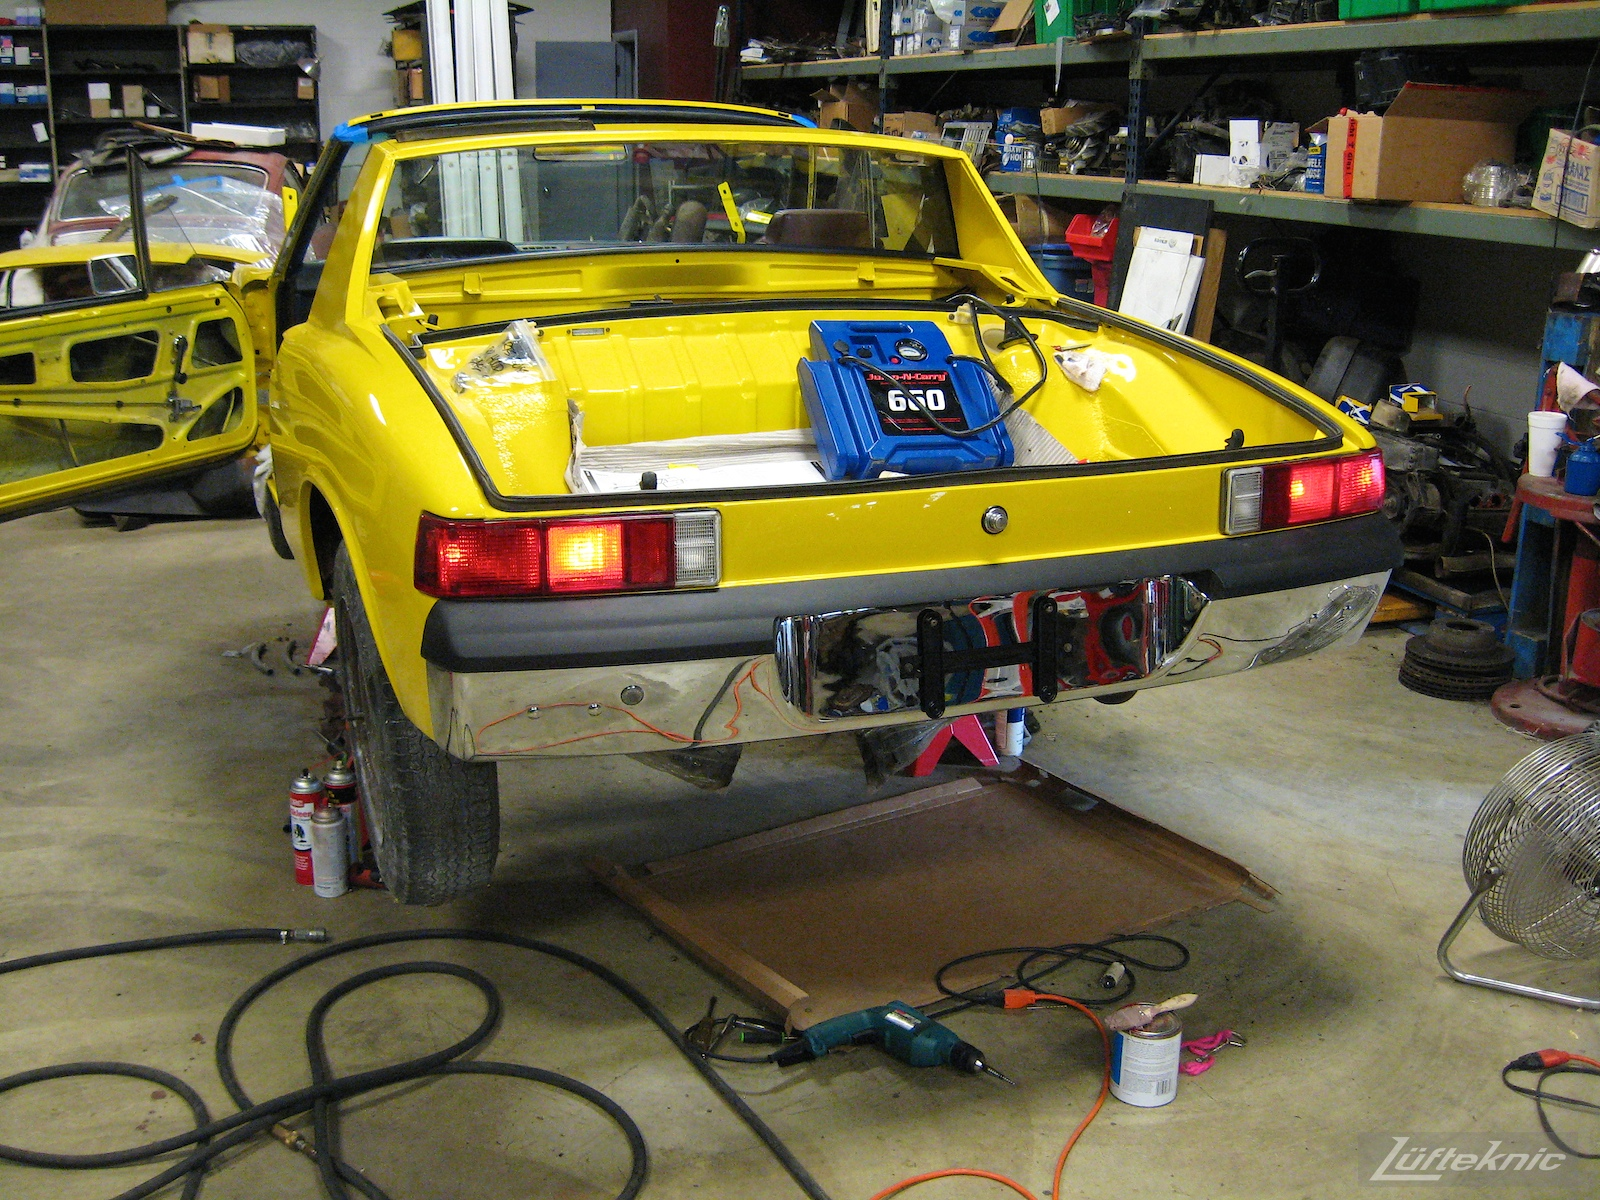 Illuminated rear tail lights on a restored yellow Porsche 914 at Lufteknic.